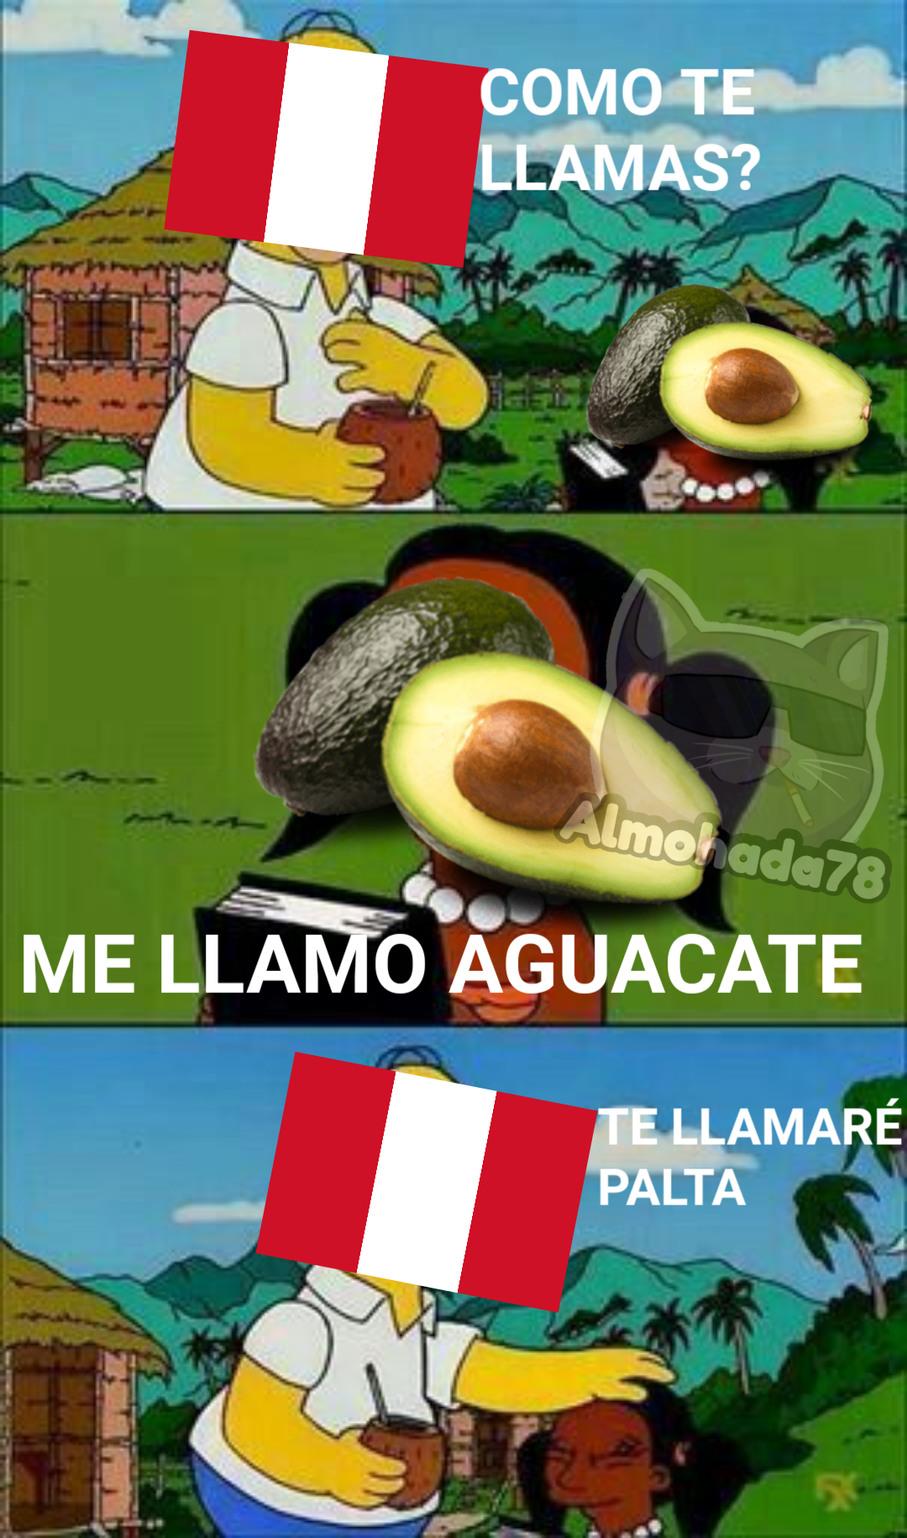 Confirmen Hermanos Peruanos - meme